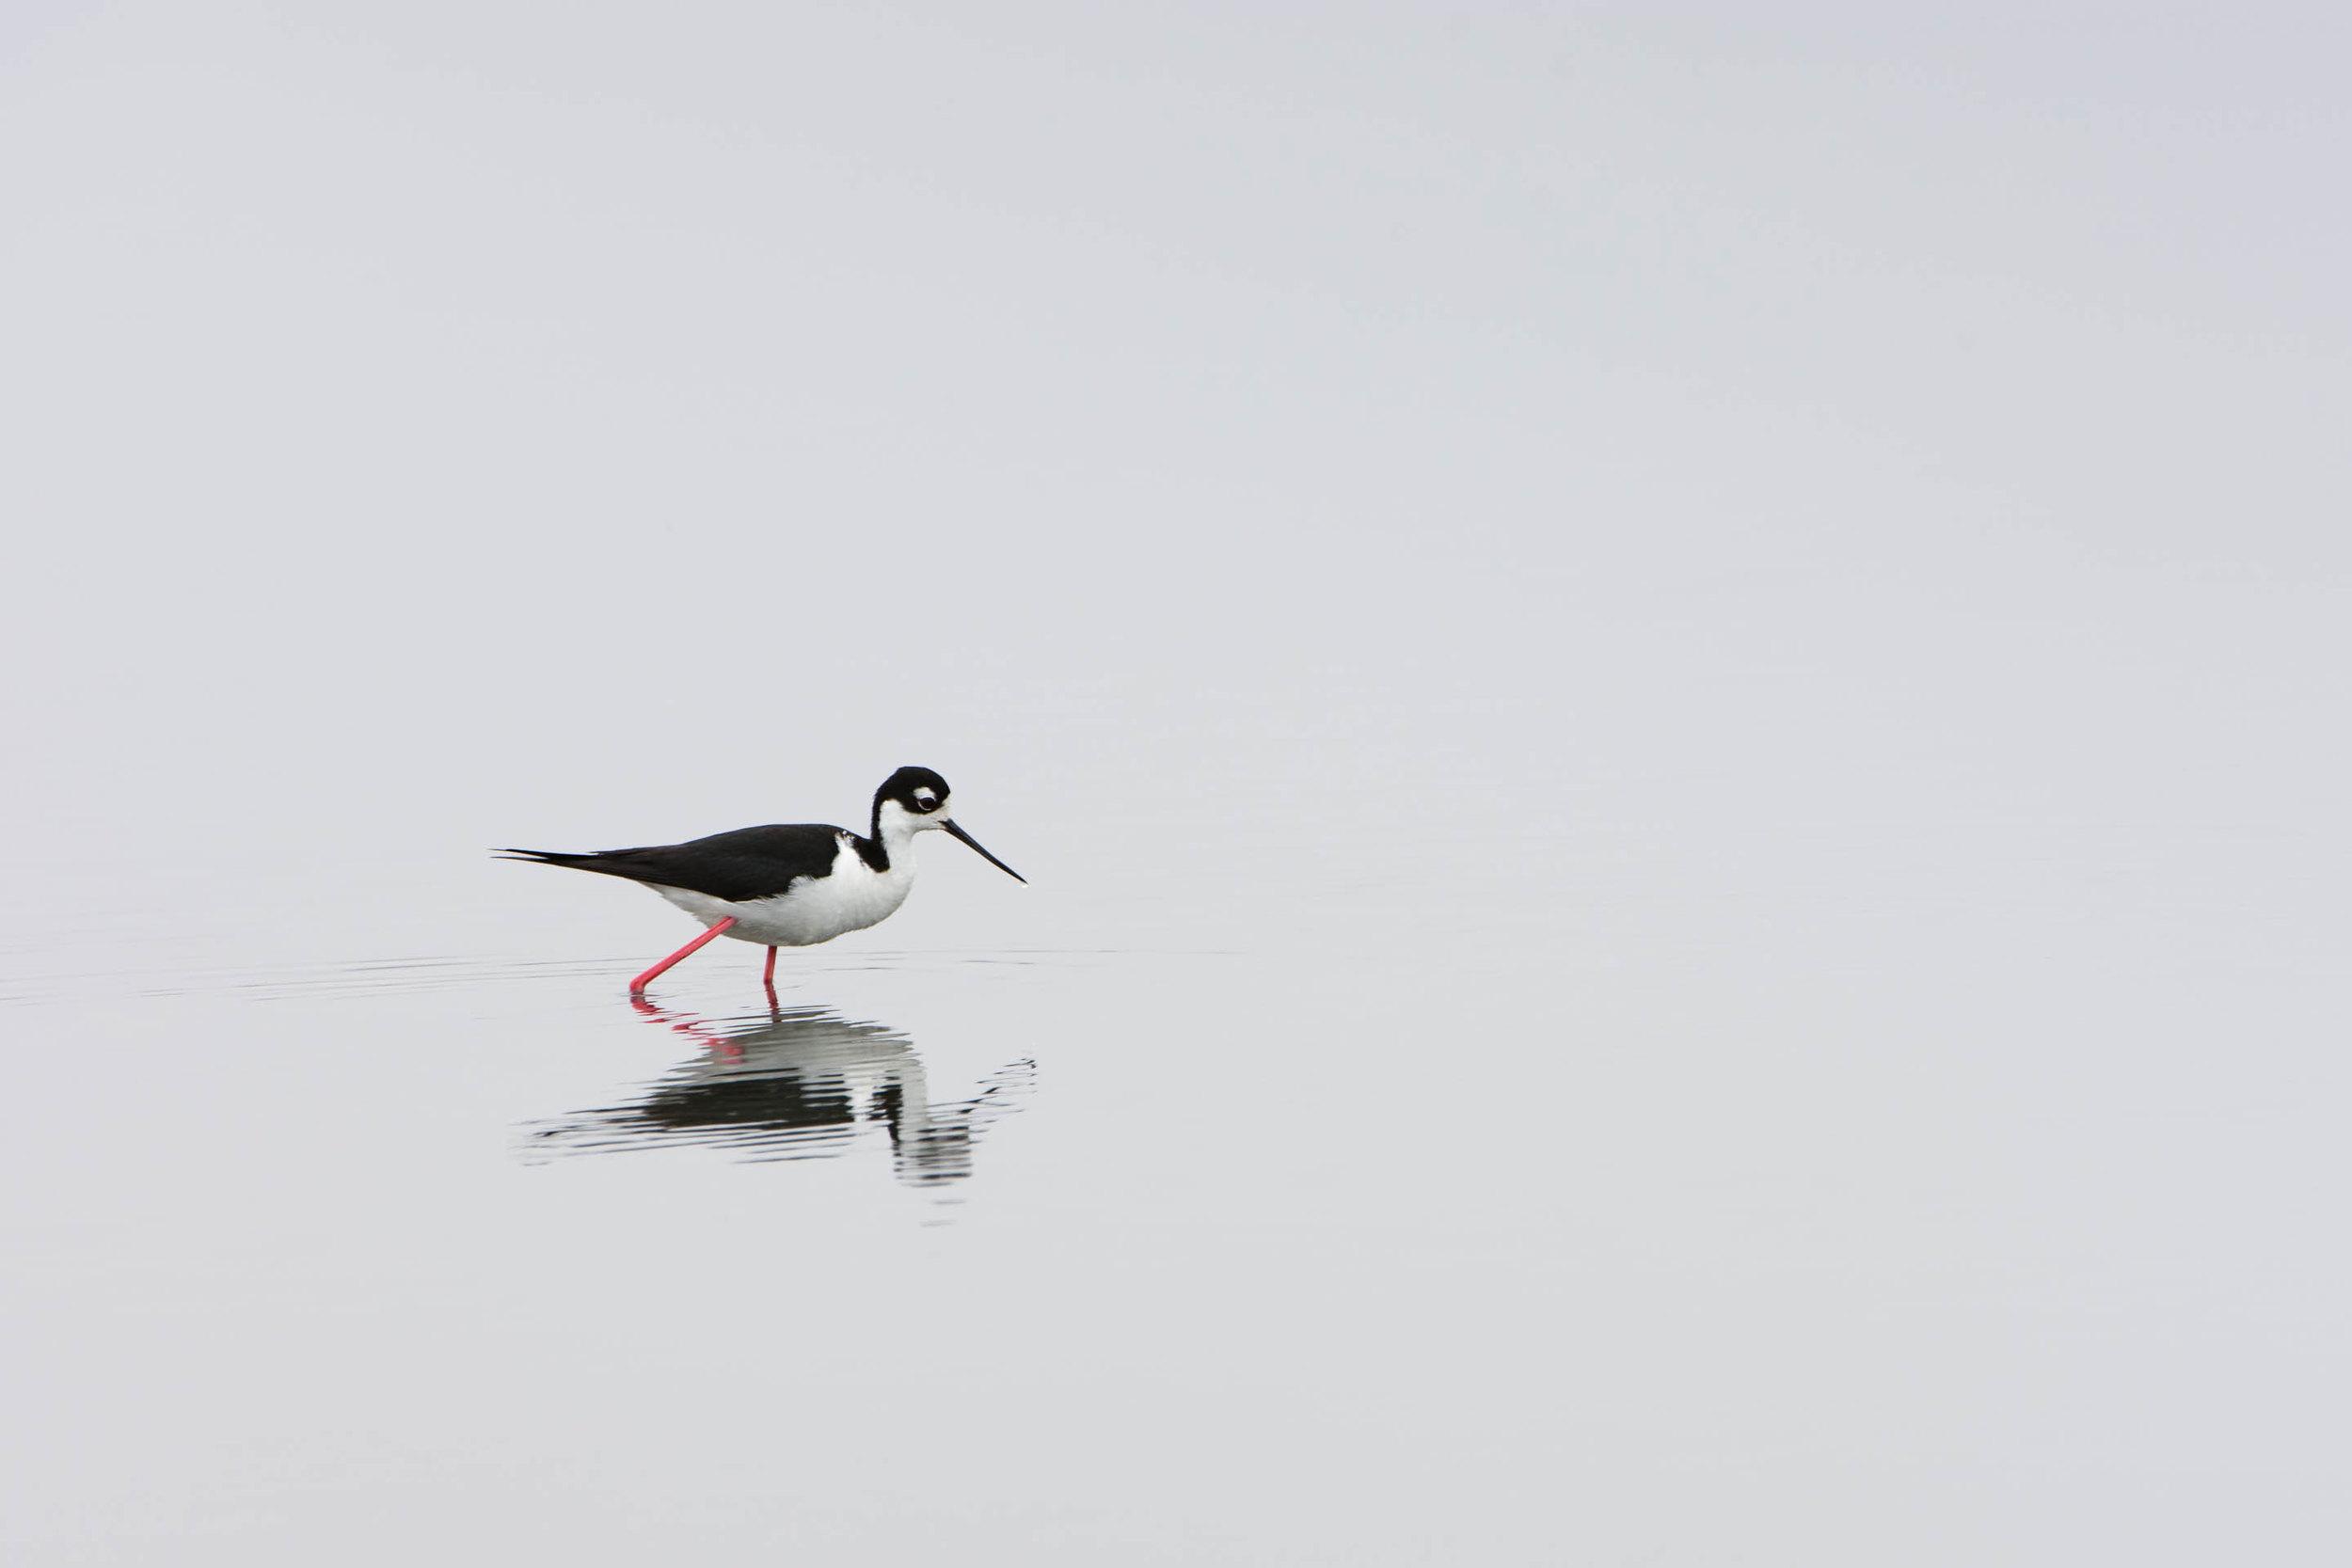 Black-necked Stilt  (Himantopus mexicanus) - Moss Landing, CA  Nikon D7200 + Nikon 200-400mm f4 VR1